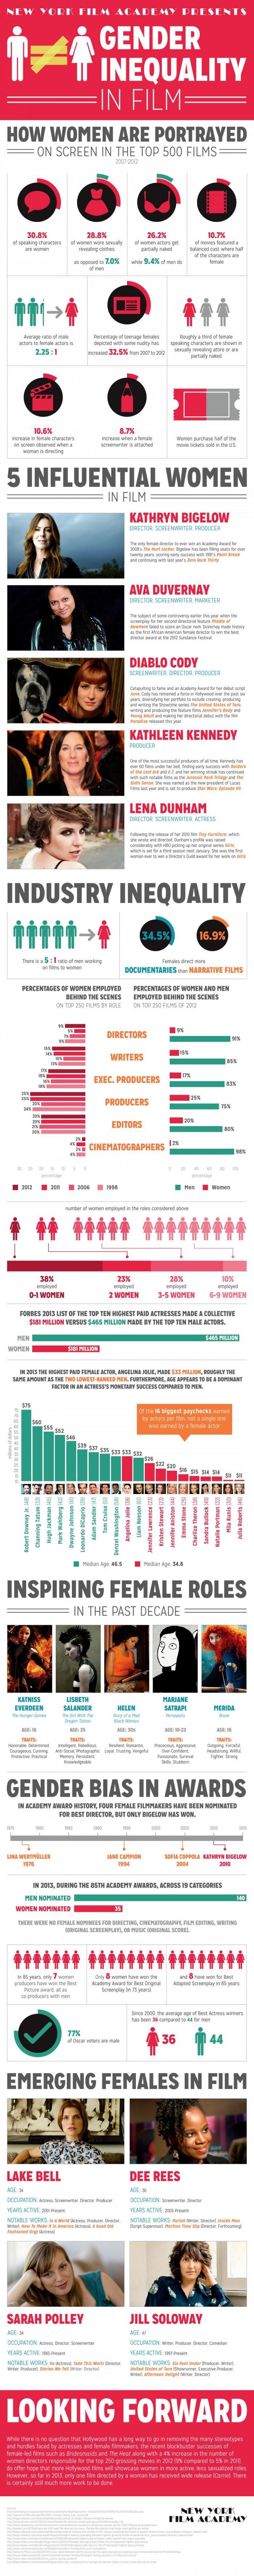 Gender Inequality in Film